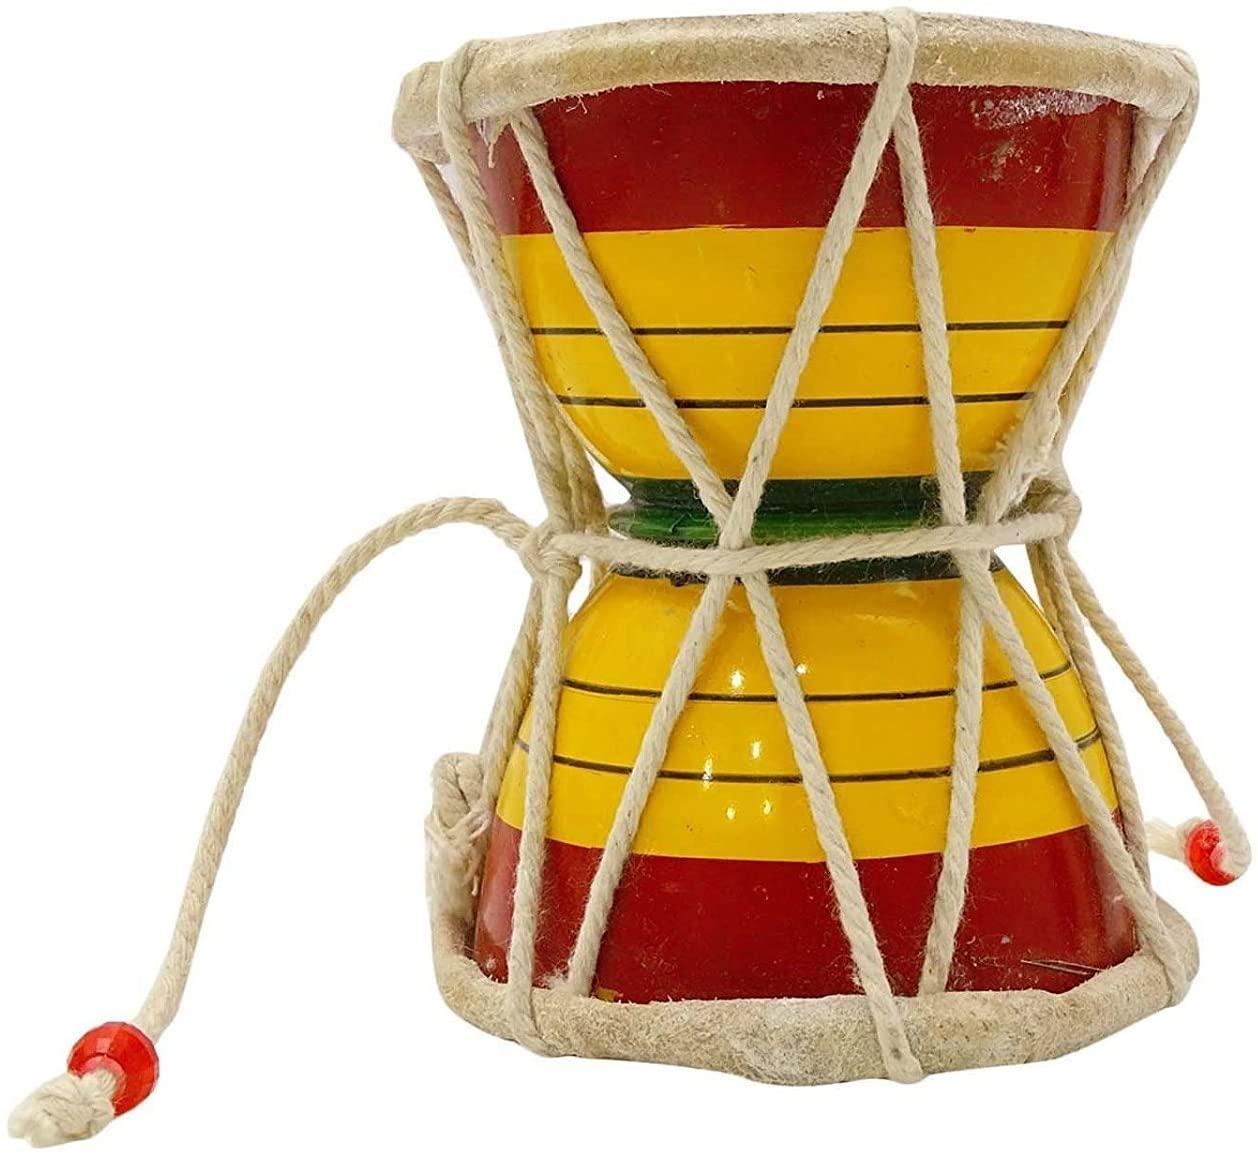 Wooden Hand Held Small Drum Damaru Damroo Percussion Djembe Drum - Nice Sound - JIVE BRAND